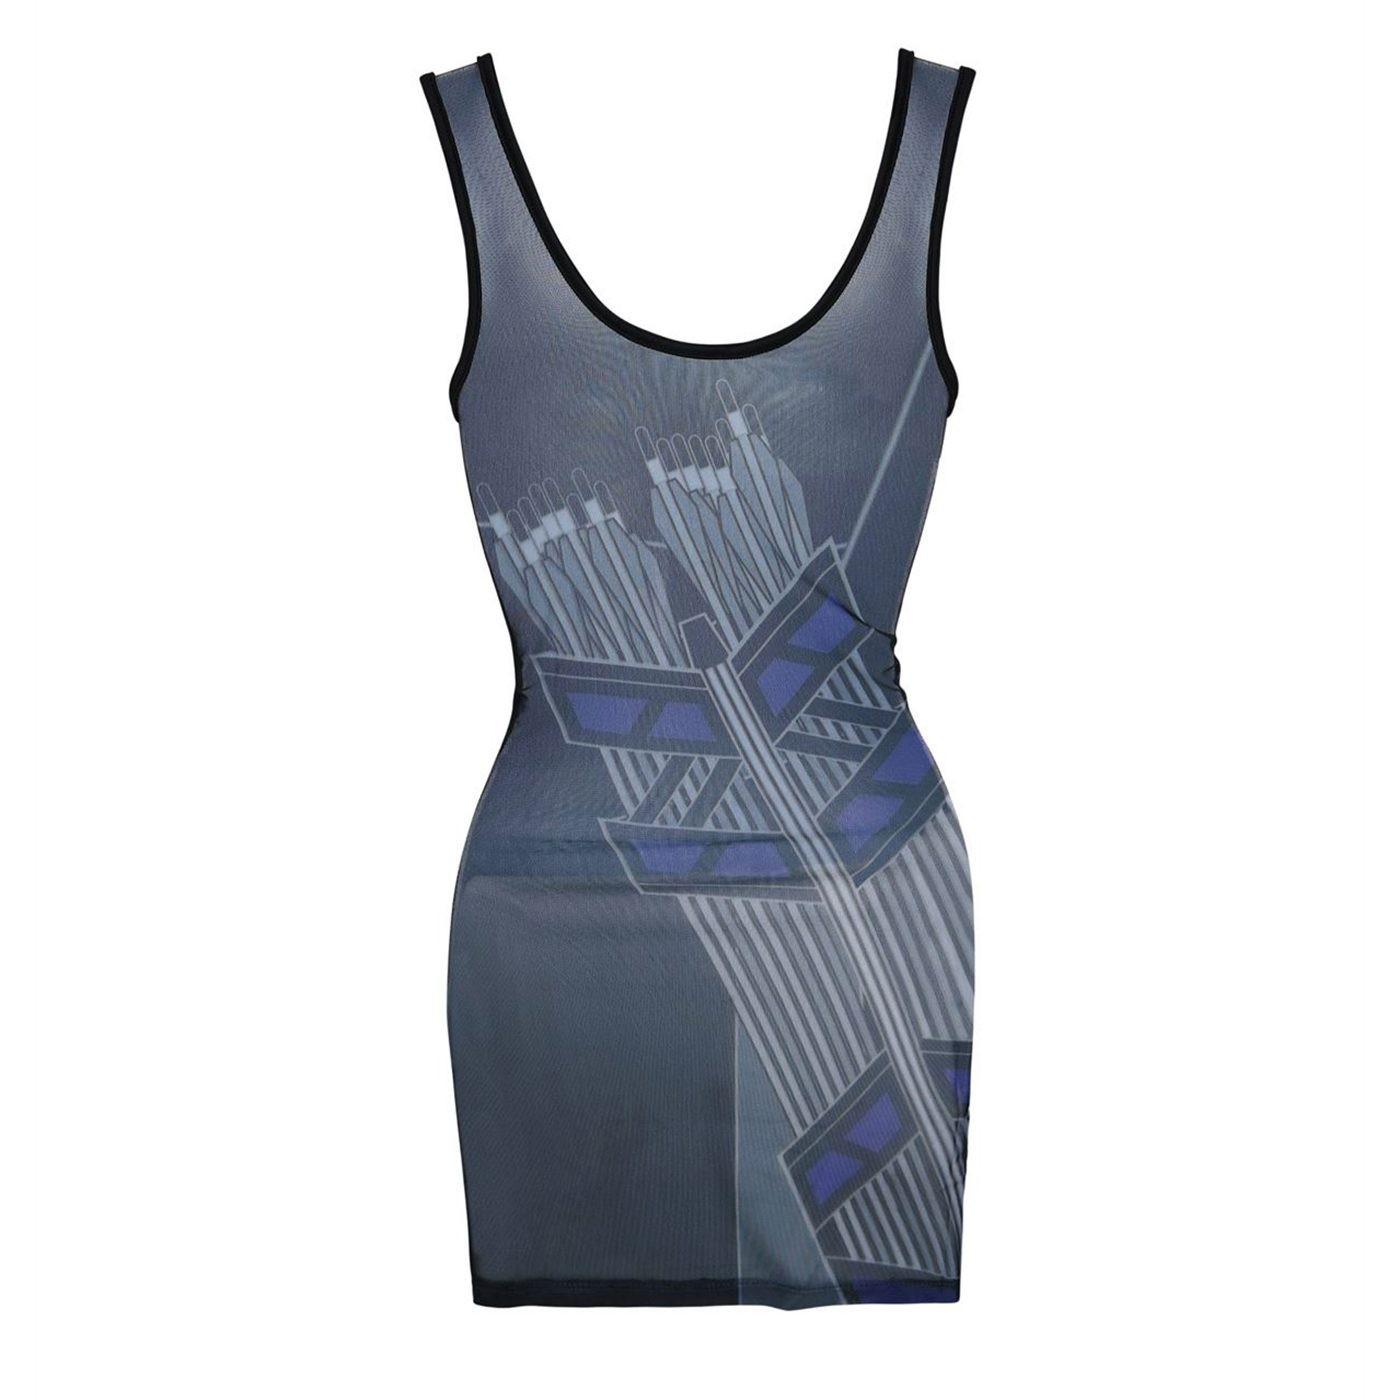 Hawkeye Costume Women's Mesh Back Dress